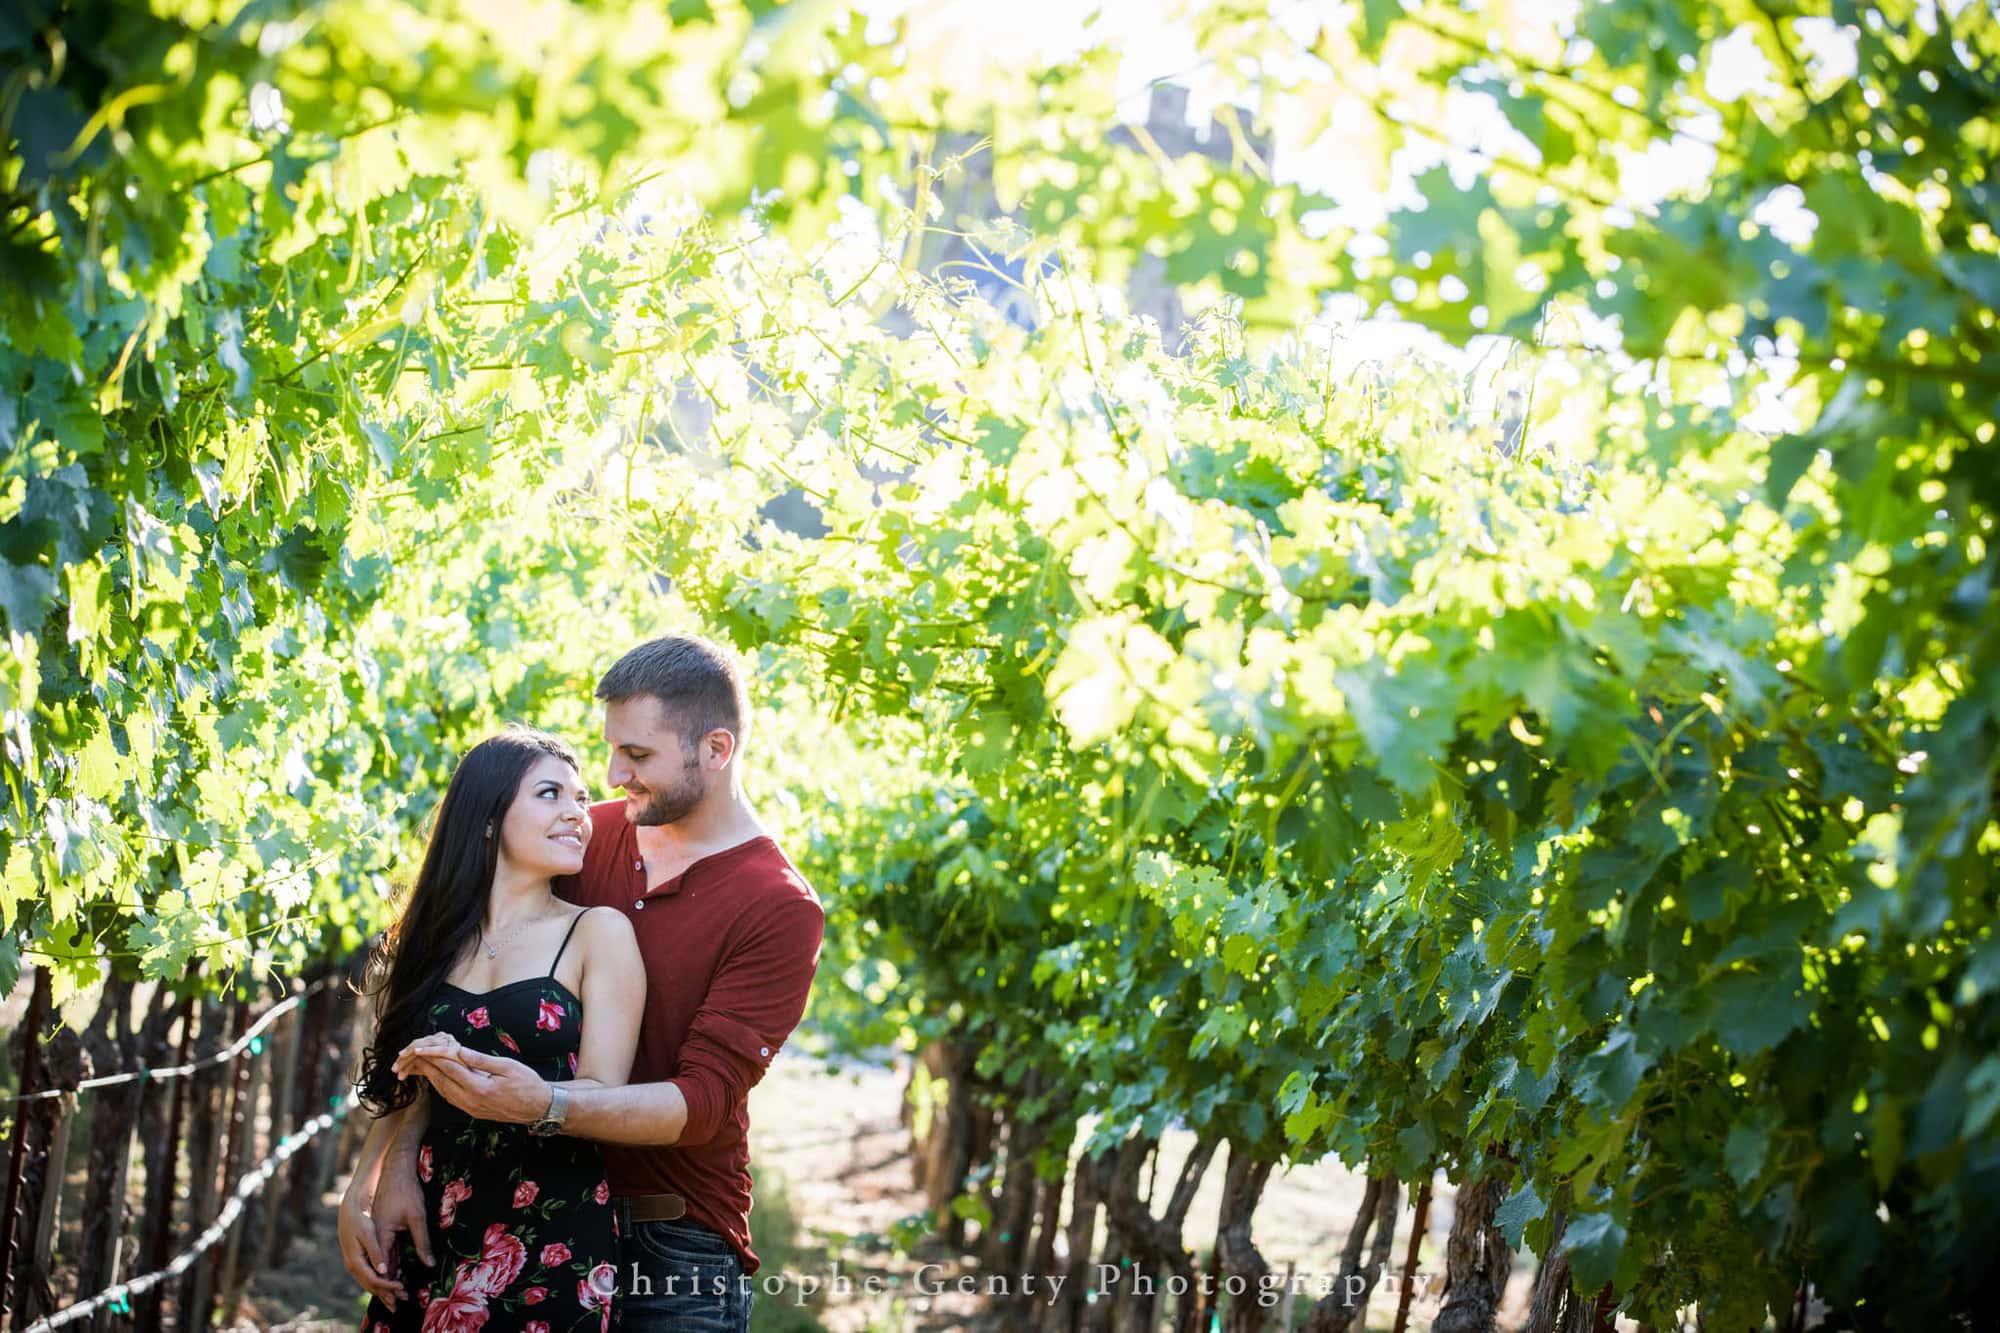 Castello di Amorosa Marriage Proposal Photography 343